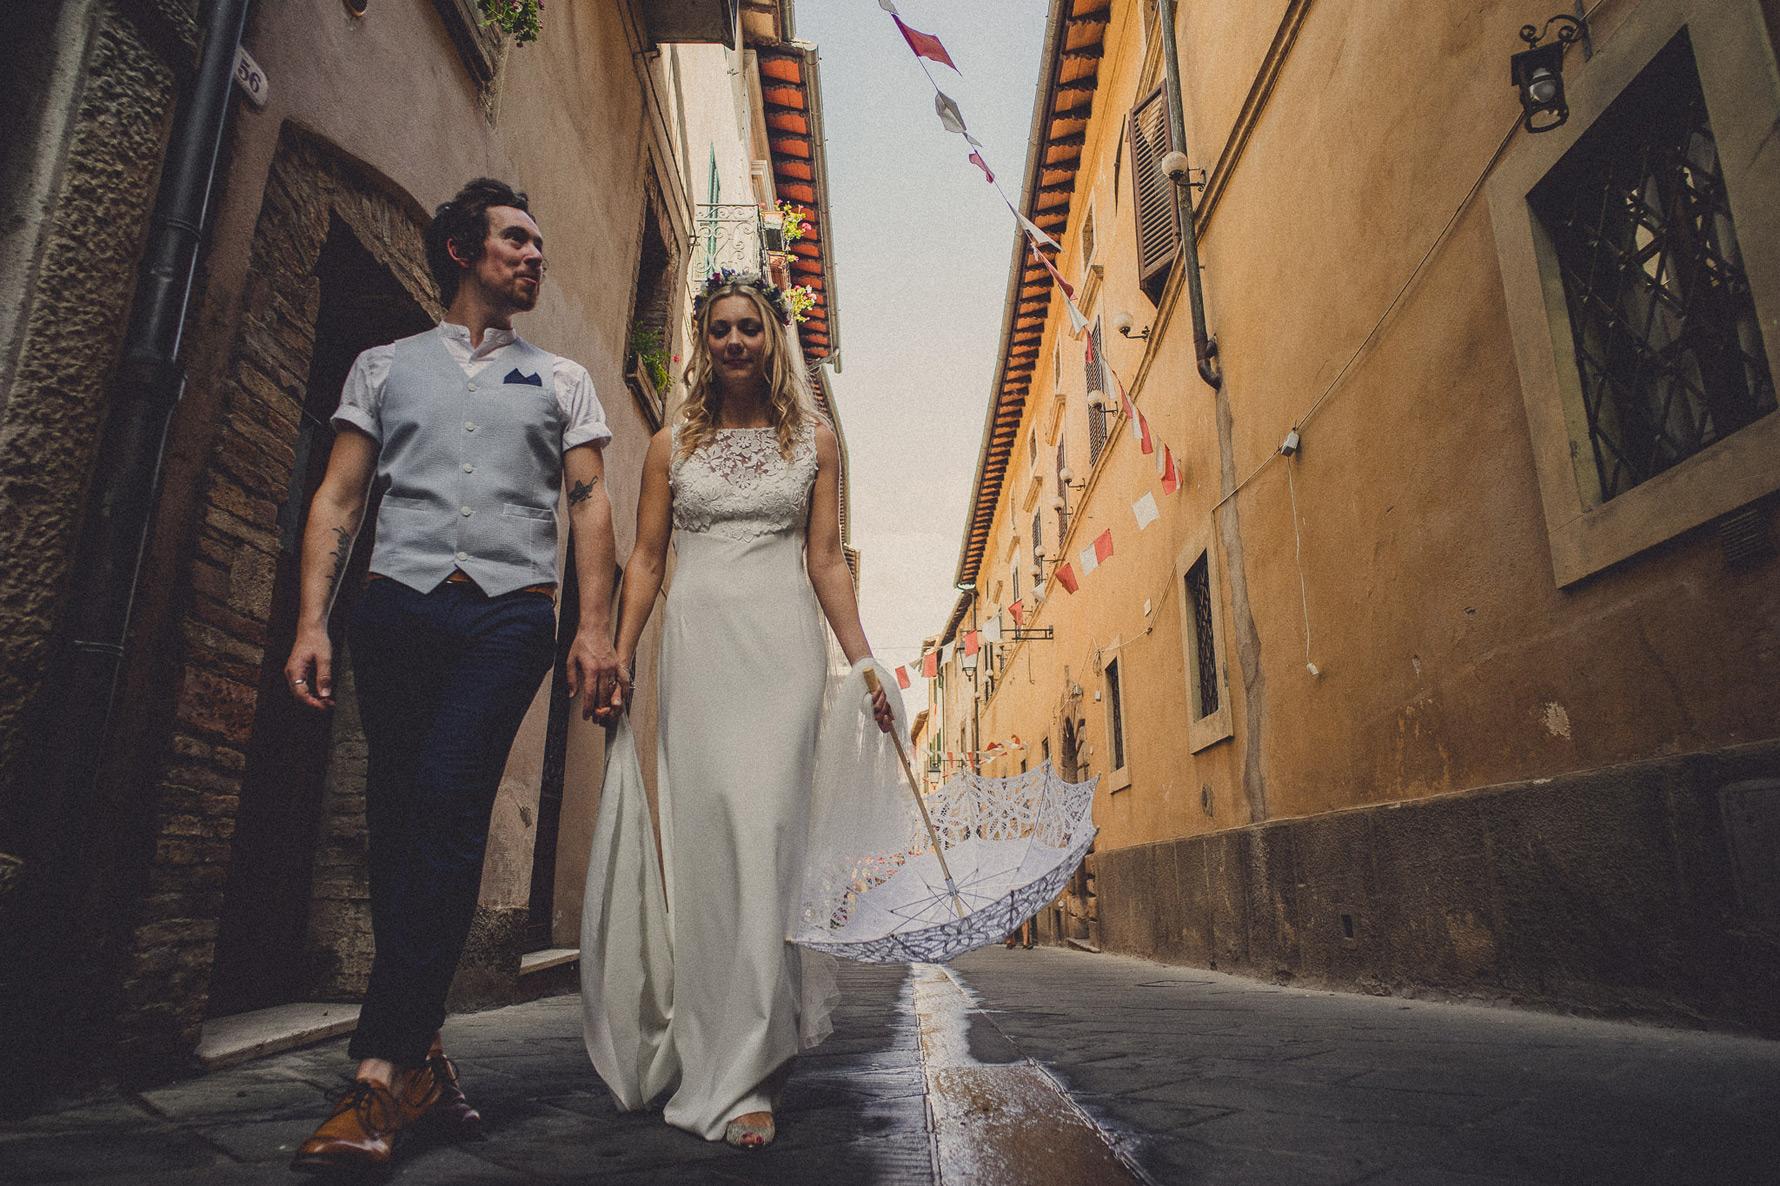 wedding-in-sarteano-livio-lacurre-photography